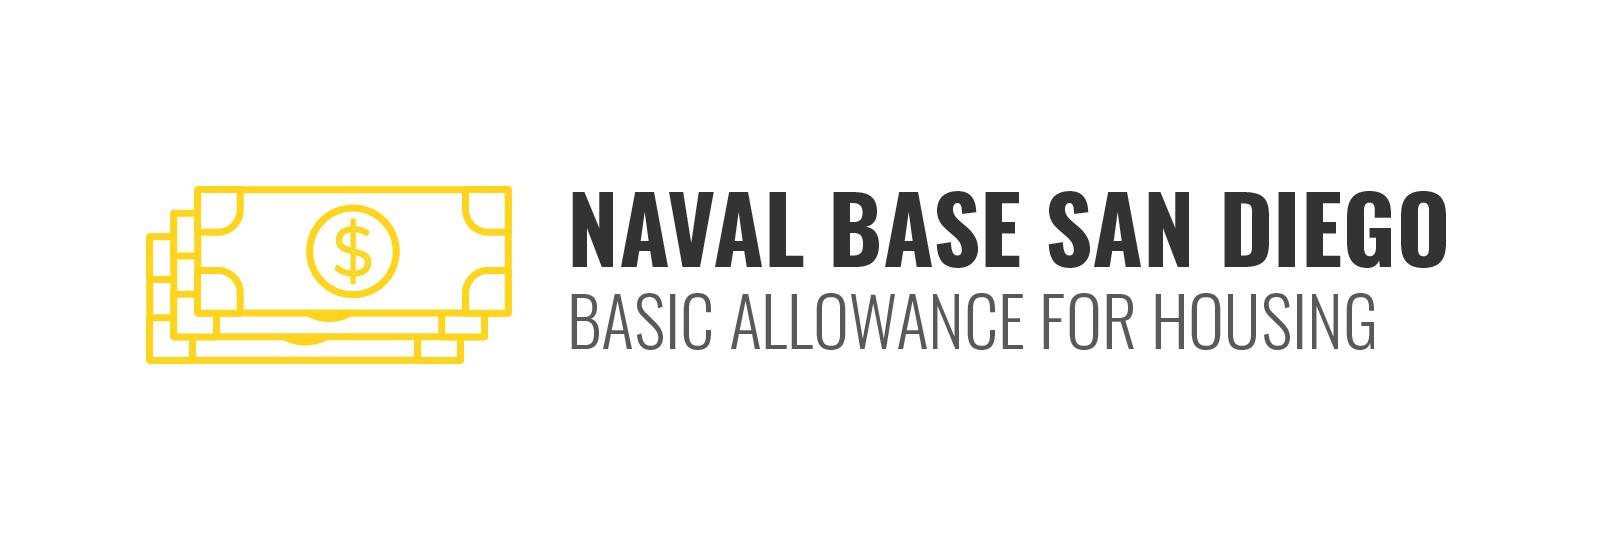 BAH Naval Base San Diego